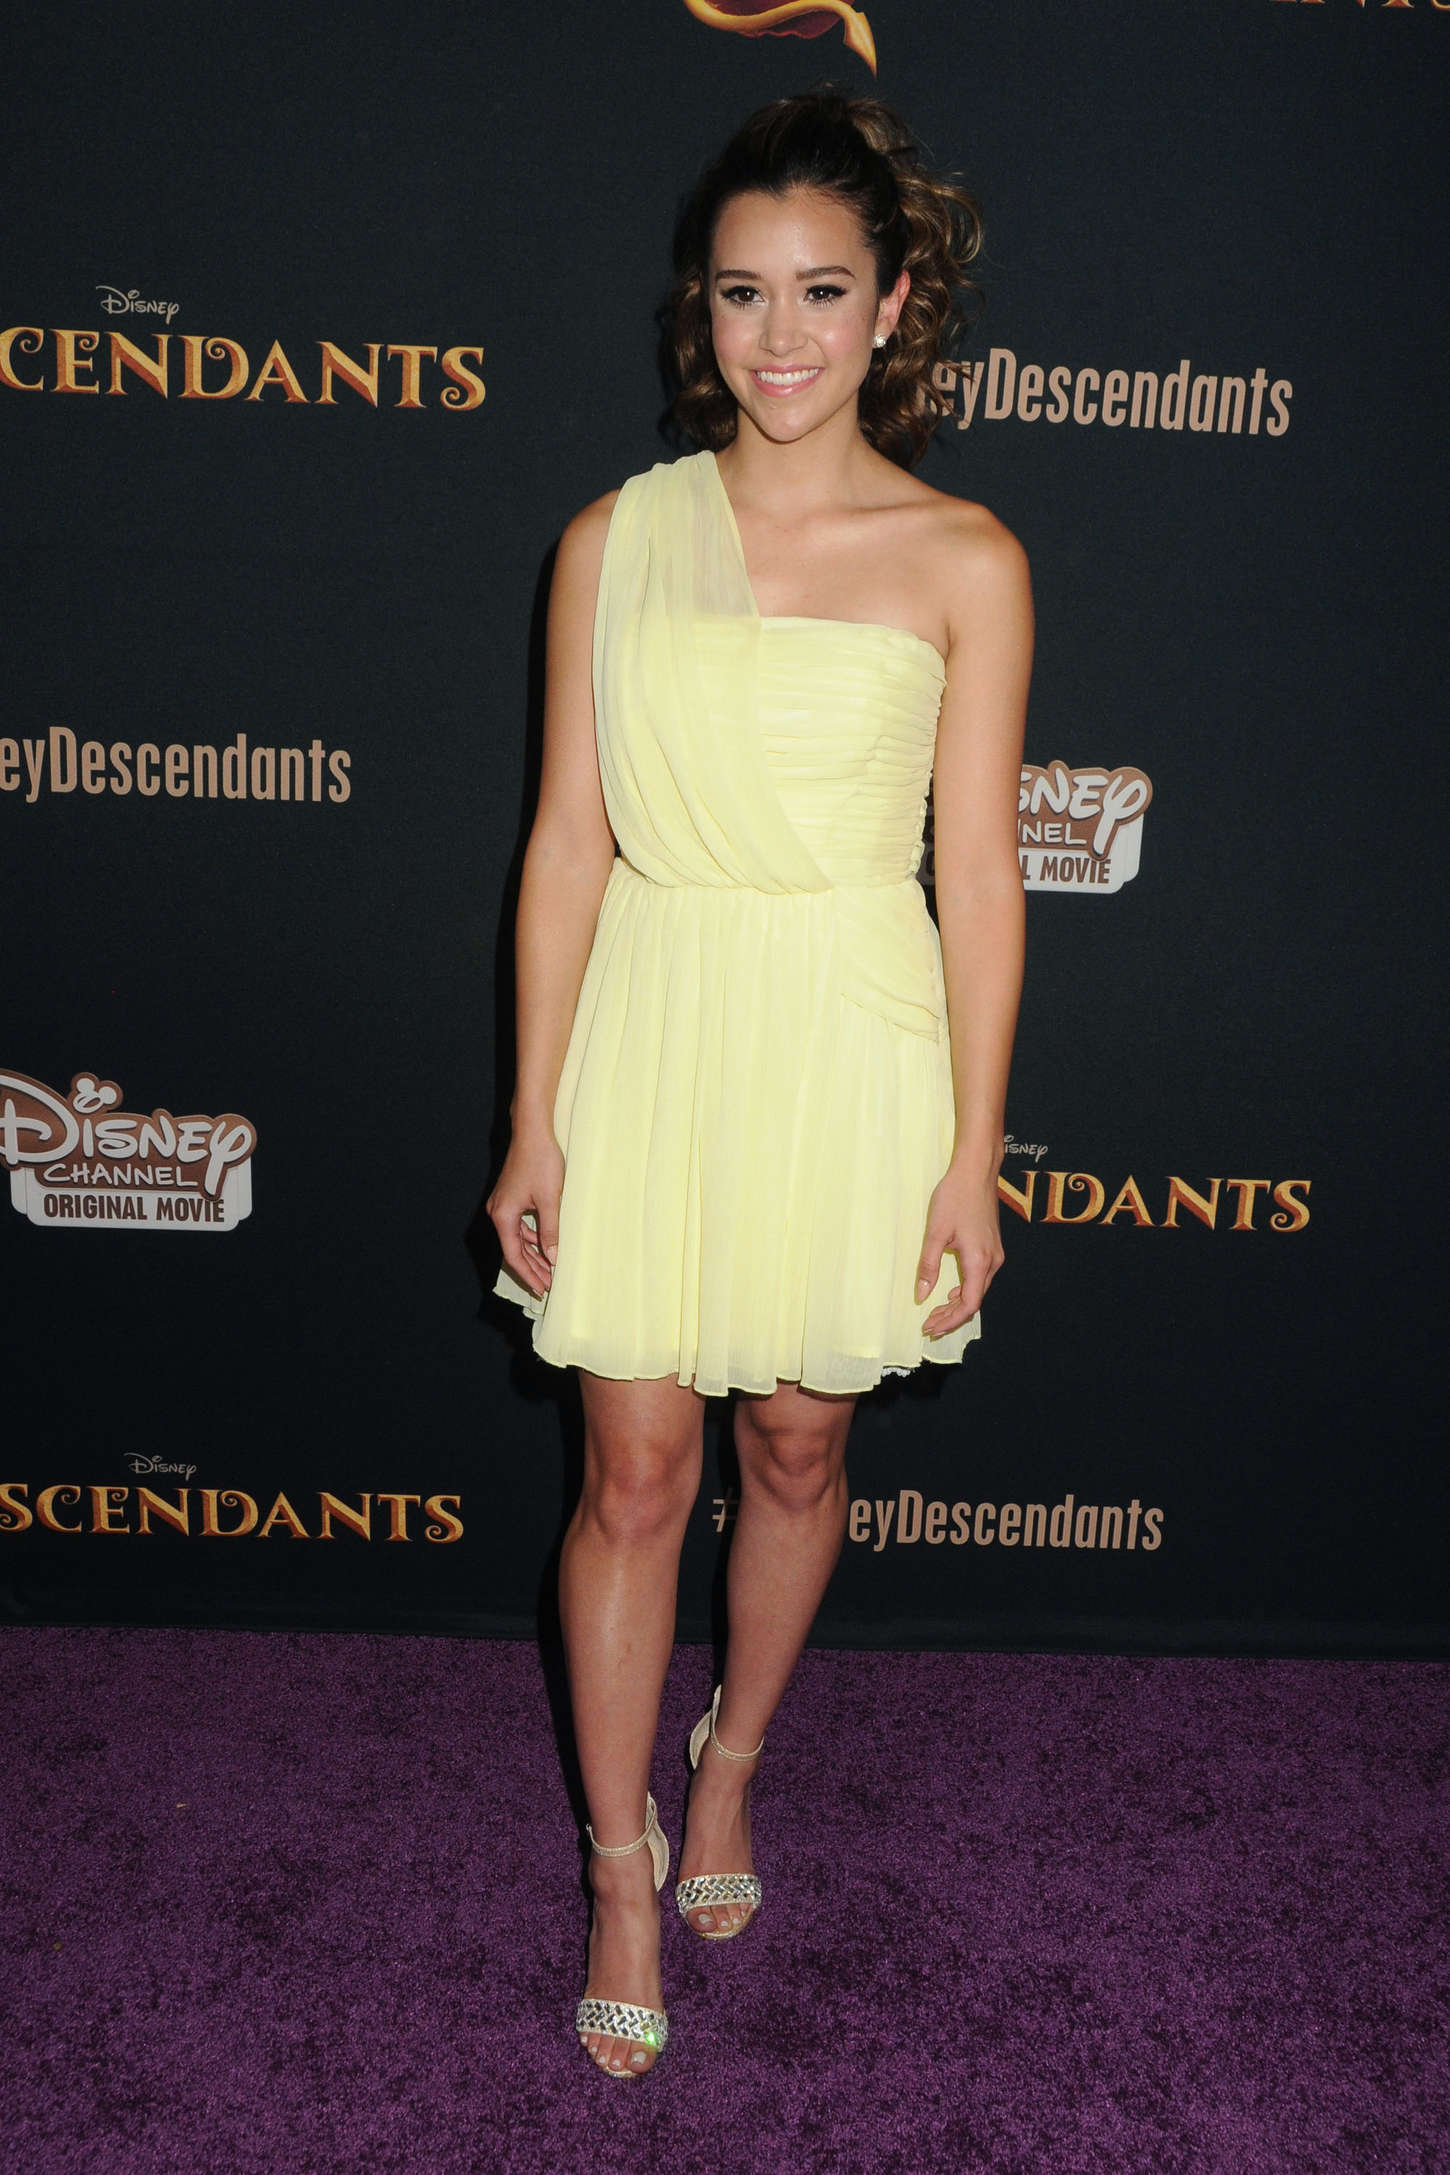 Megan Nicole Disneys Descendants Premiere in Burbank